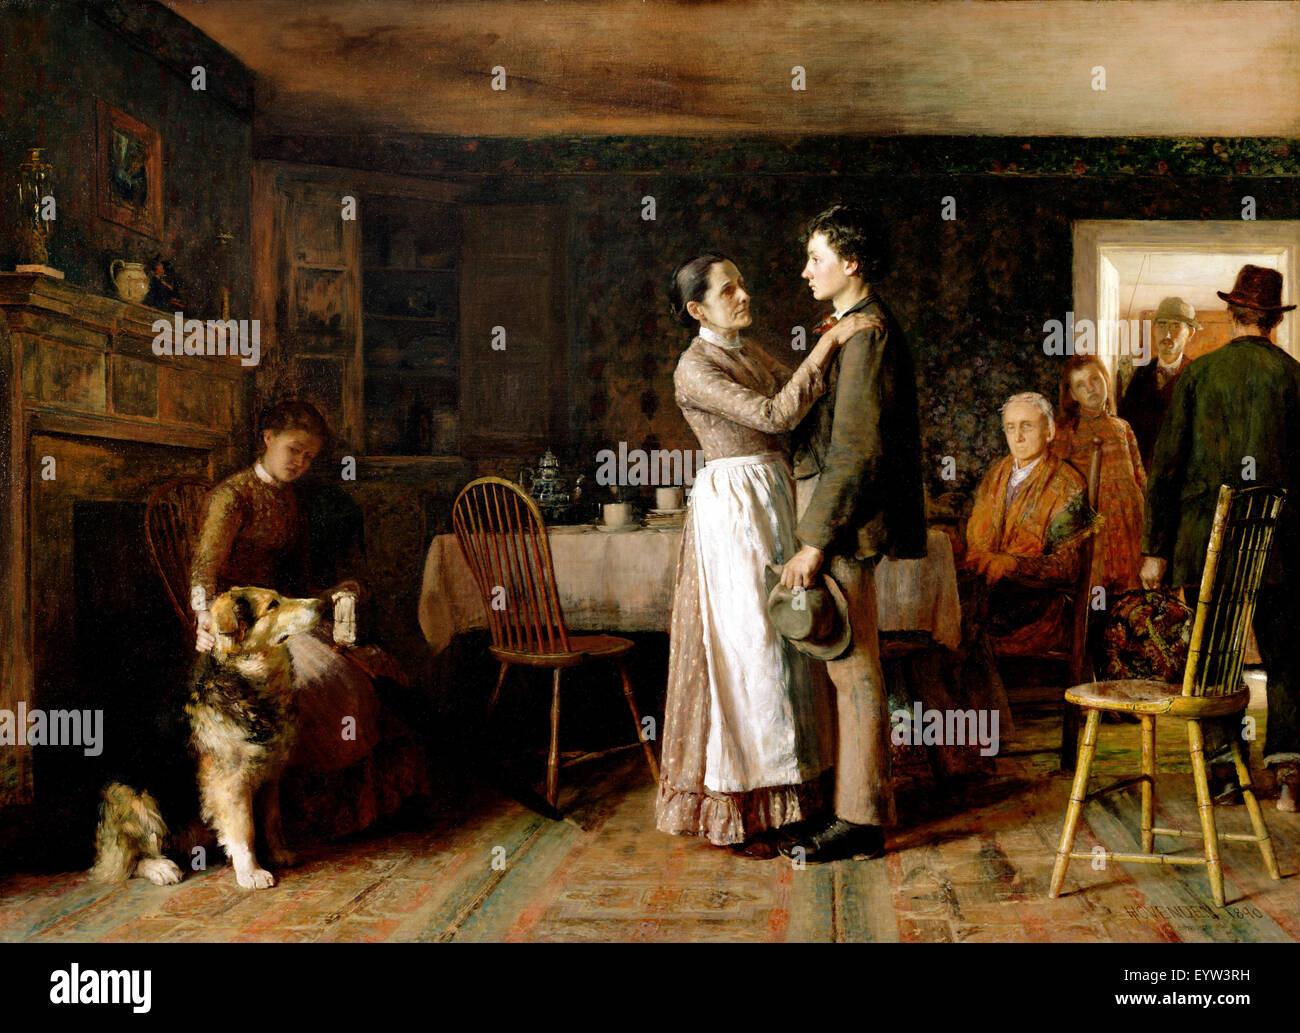 Thomas Hovenden, brisant les liens Accueil 1890 Huile sur toile. Philadelphia Museum of Art, USA. Photo Stock